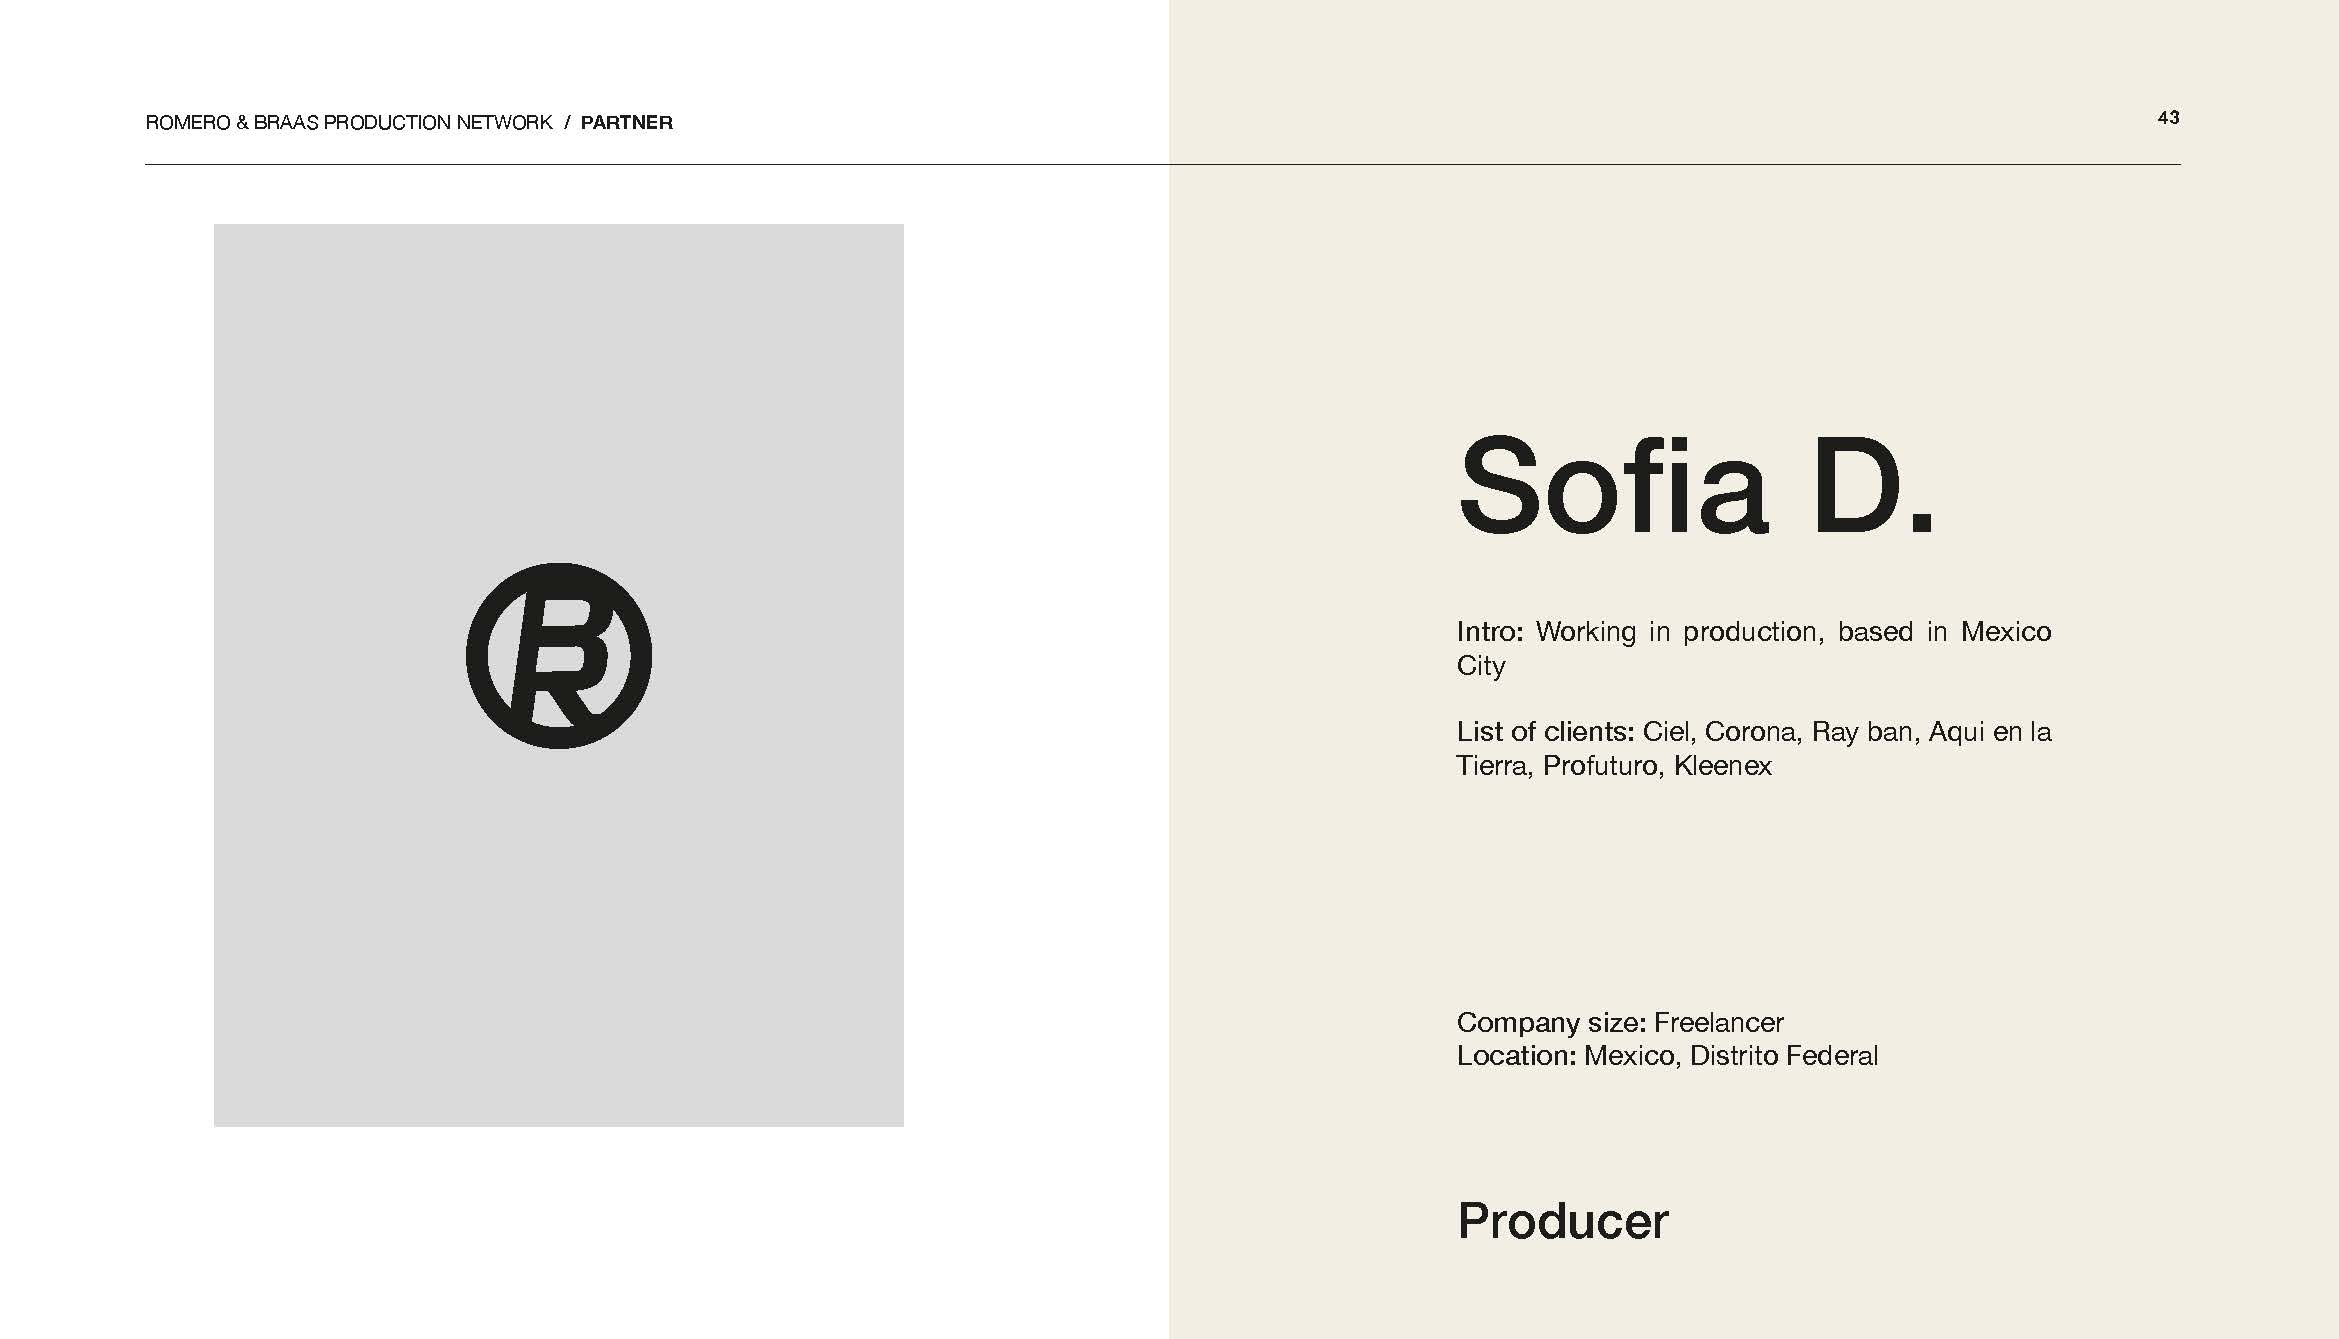 Production_Network_romeroandbraas_Seite_43.jpg